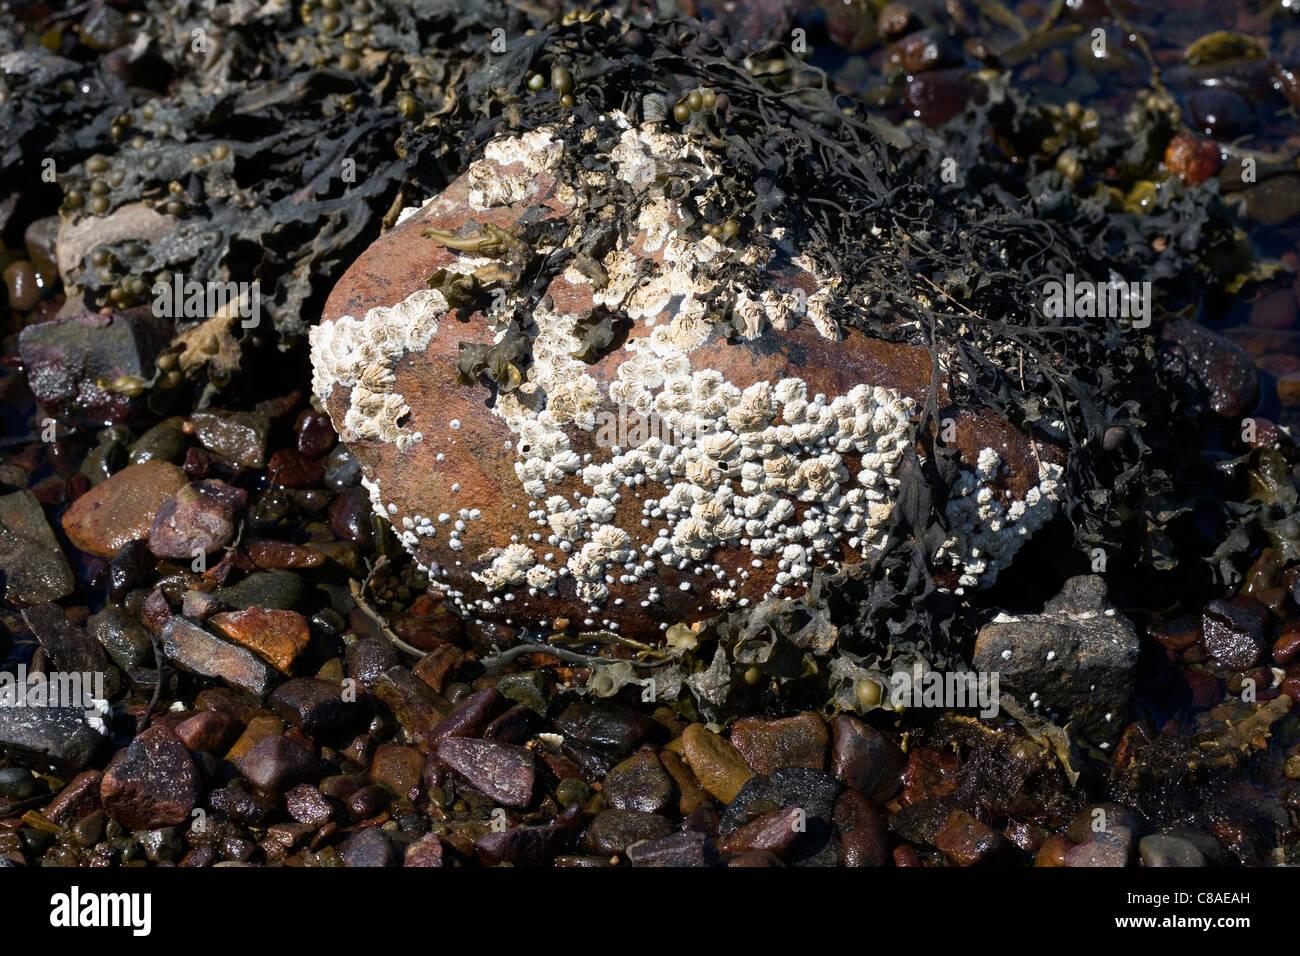 Common Limpets and Acorn Barnacles Rubha Ardnish Beach Breakish Broadford Isle of Skye Scotland Stock Photo